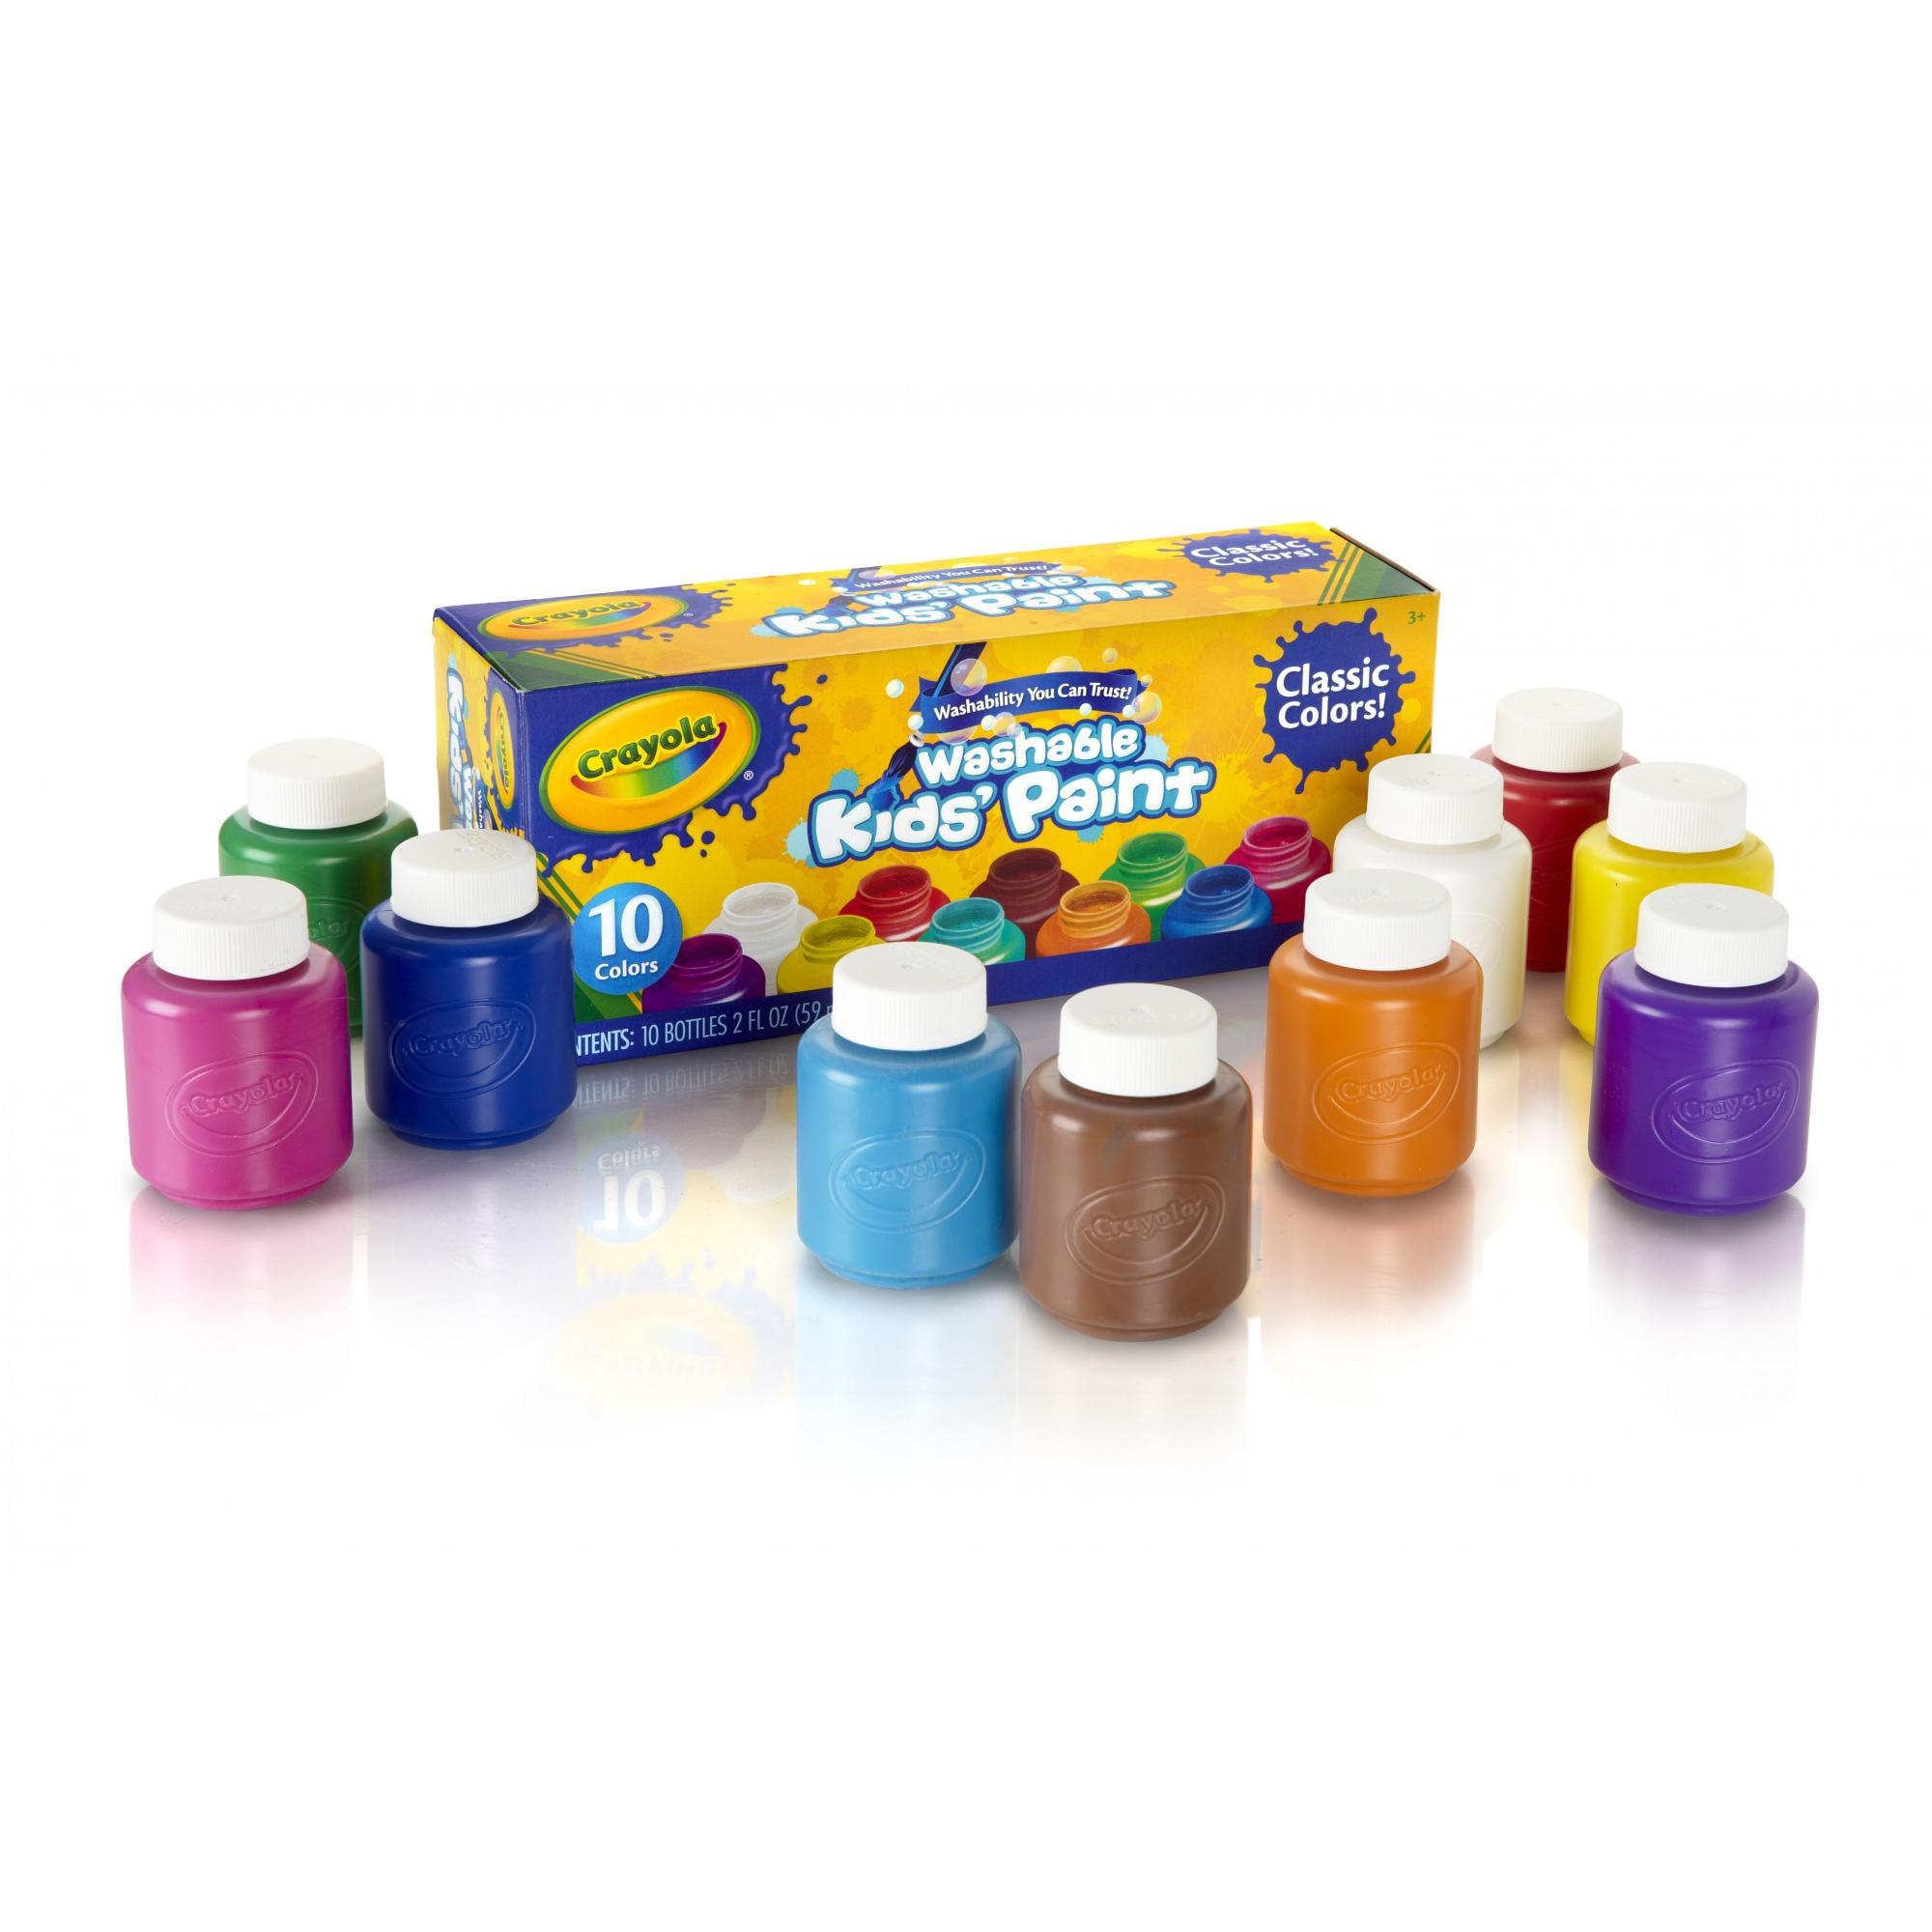 Crayola 10 count Washable Kids Paint in 2 oz. bottles - Walmart.com